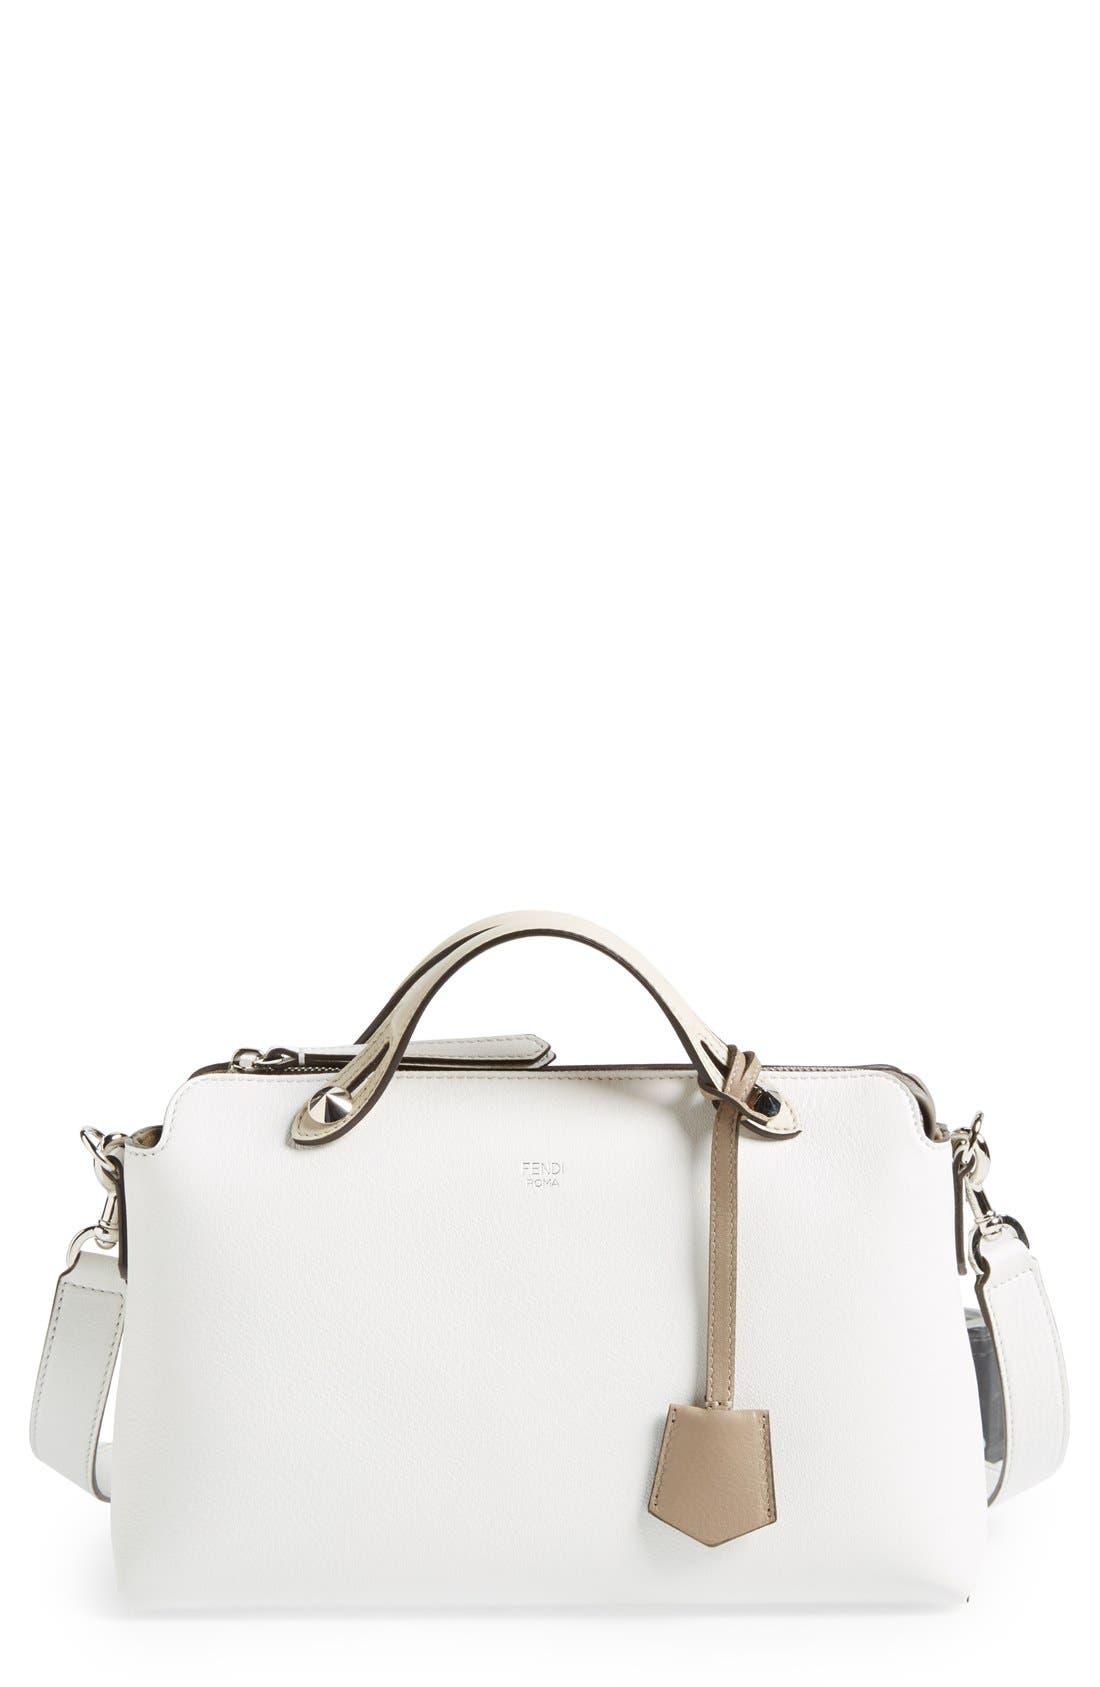 Main Image - Fendi 'Small By the Way' Shoulder Bag